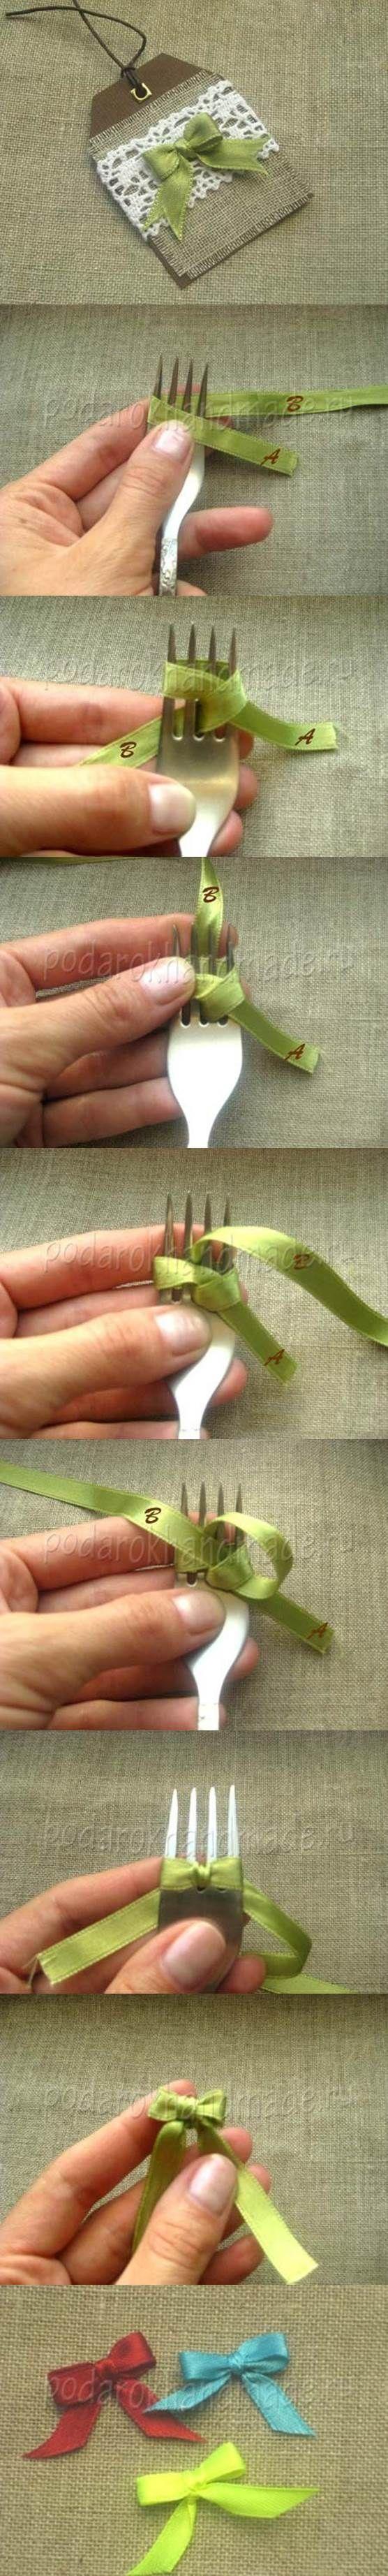 ribbon using fork